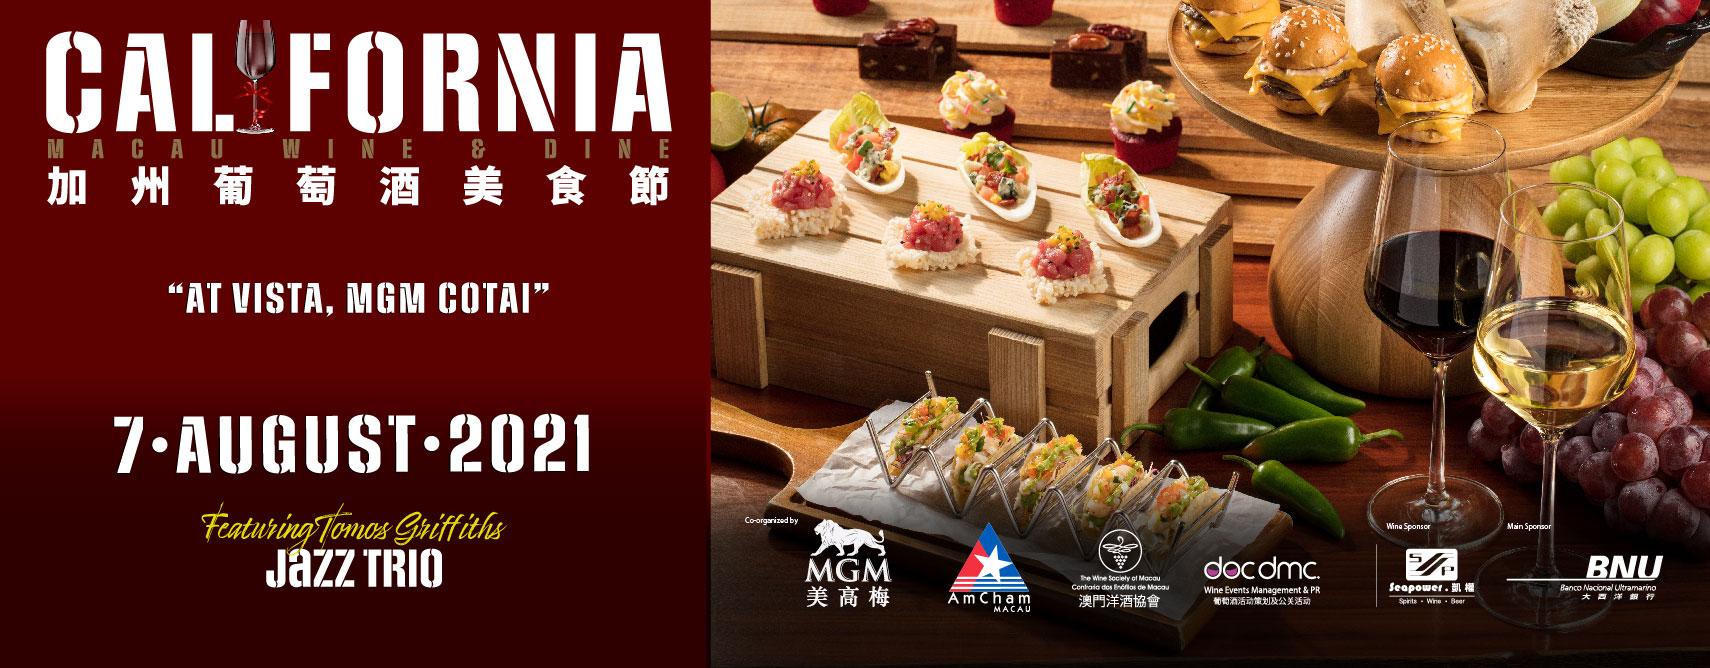 Macau Wine & Dine Events